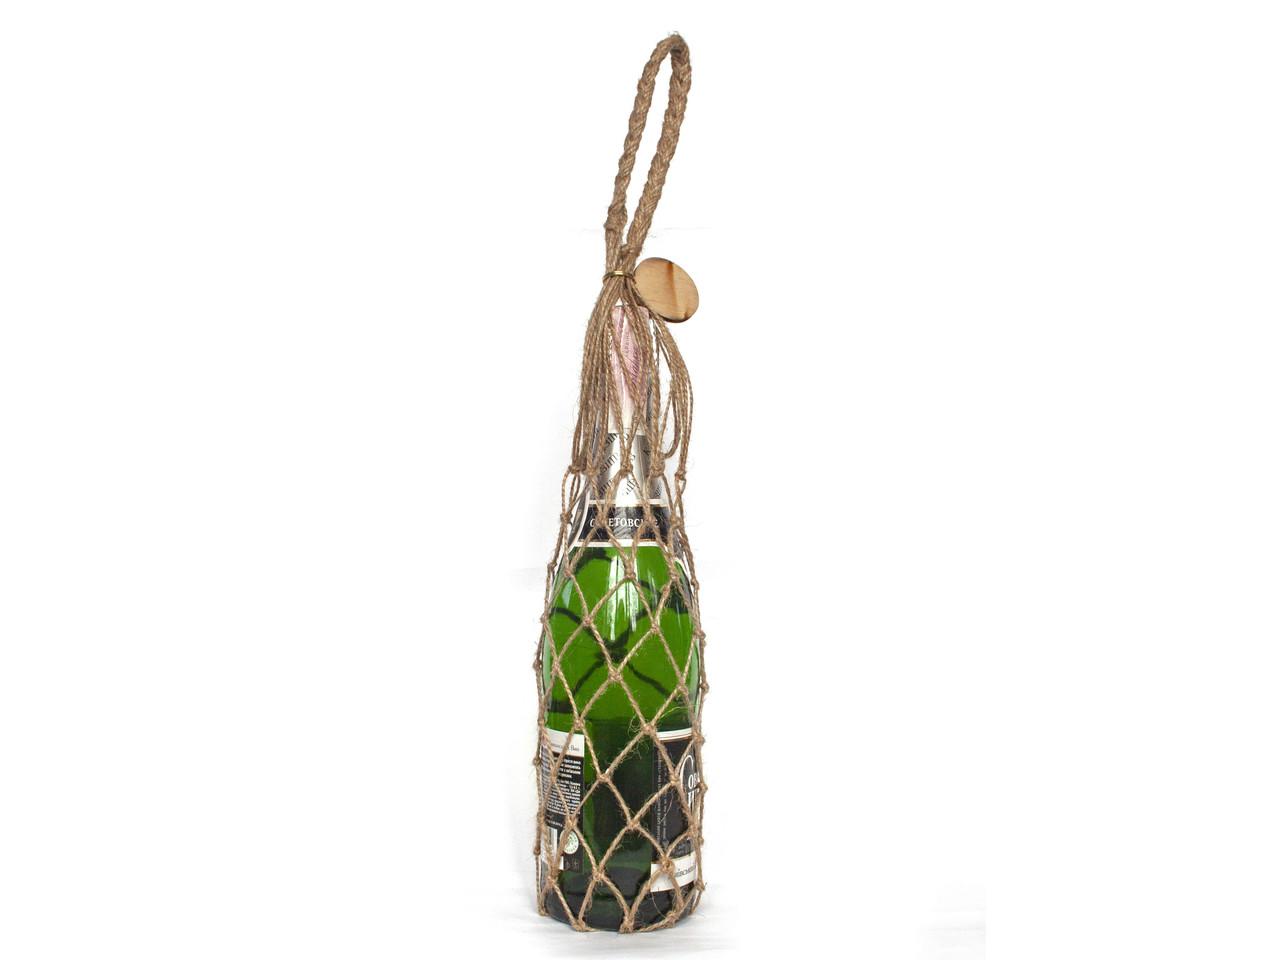 Сумка для бутылки -  подарочная сумка -  винная сумка - Авоська - Джут